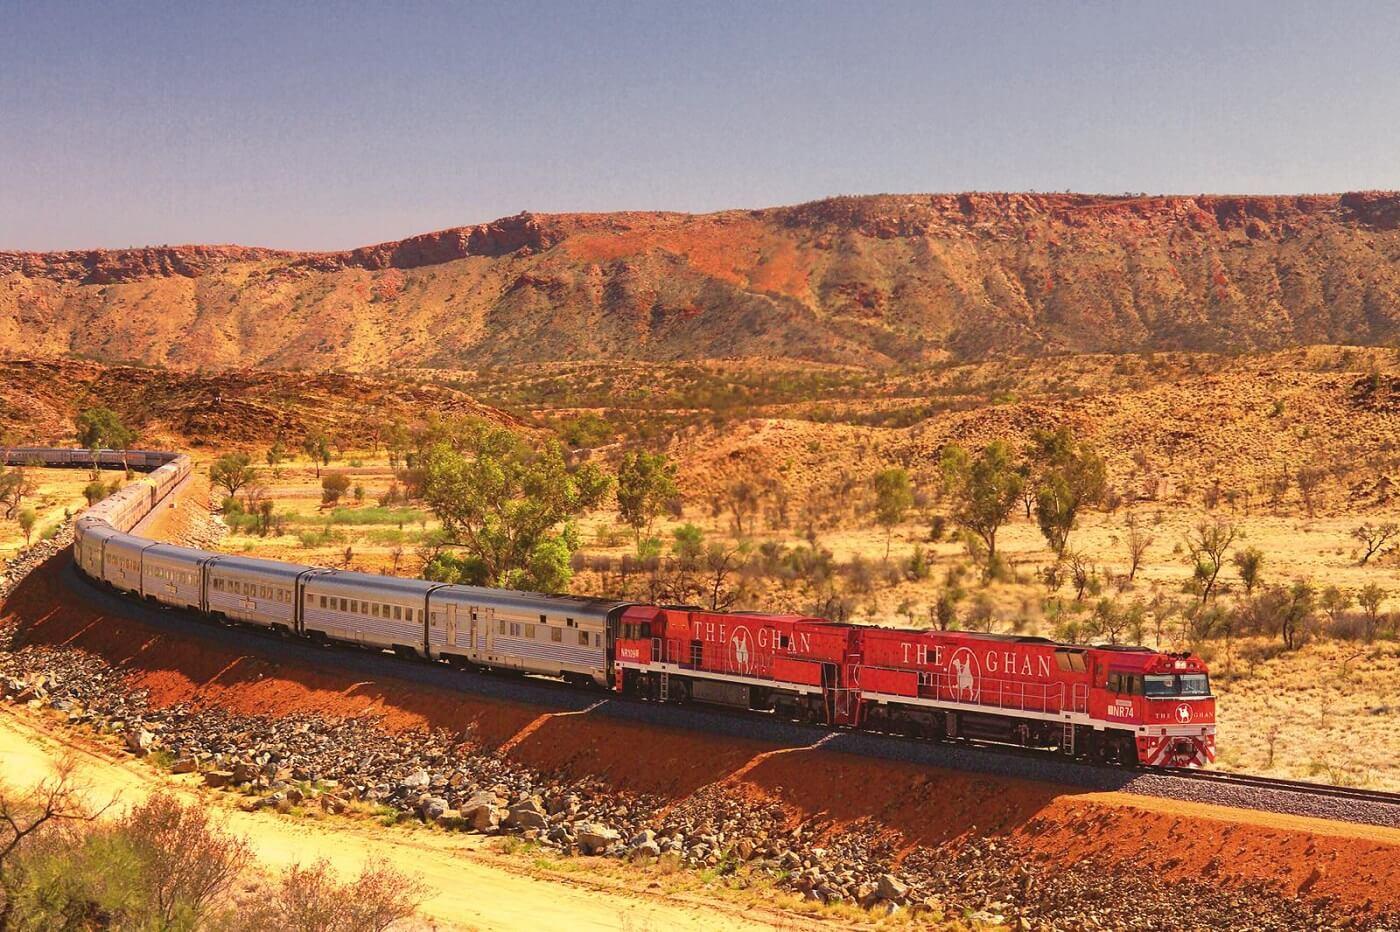 The Ghan, Australia